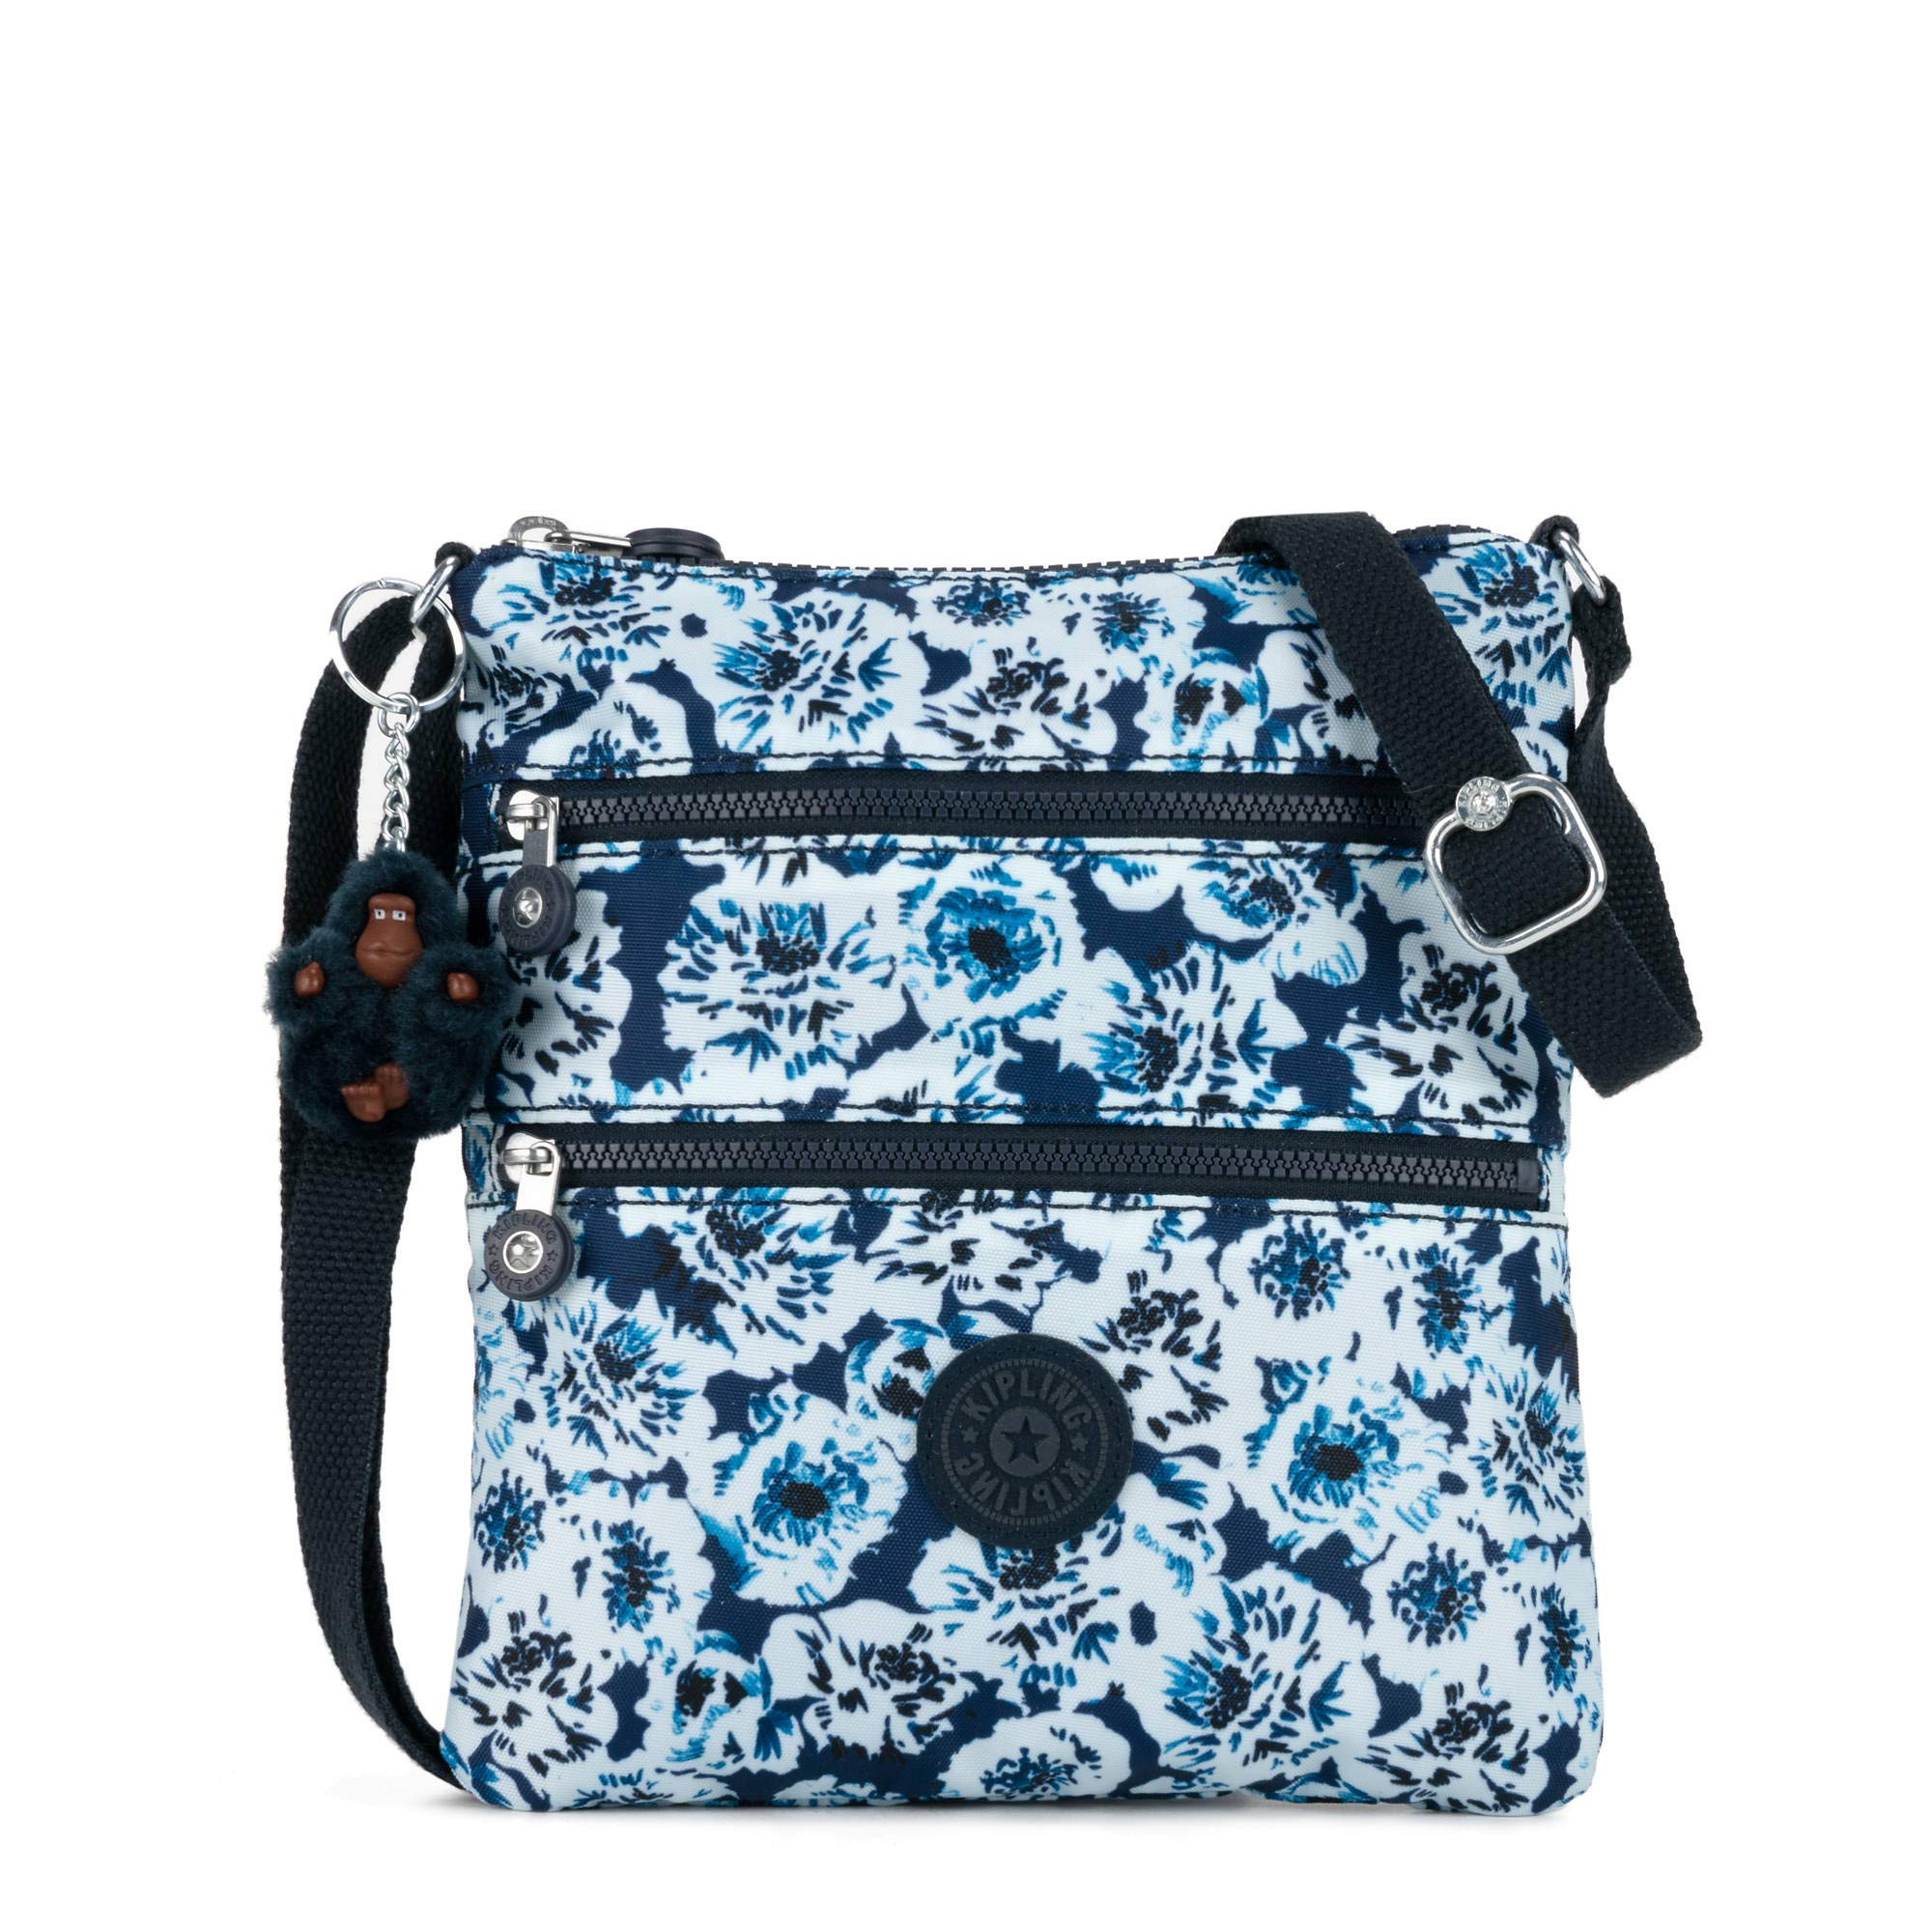 Kipling Keiko Crossbody Mini Bag One Size Roaming Roses